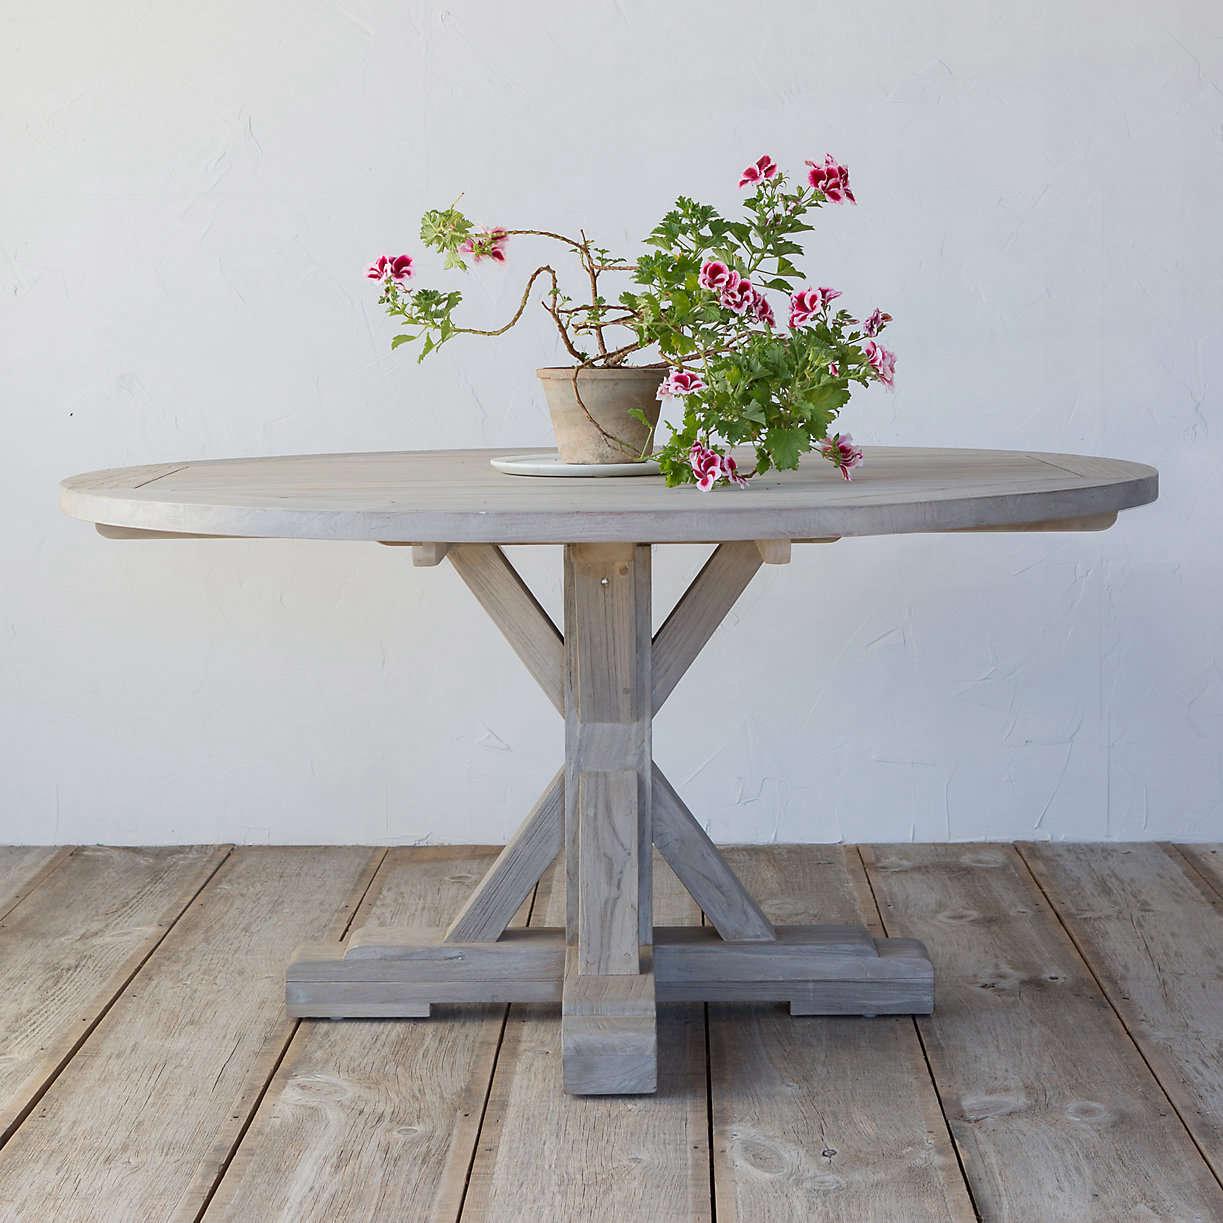 Outdoor round dining table - Round Teak Outdoor Dining Table Terrain Gardenista